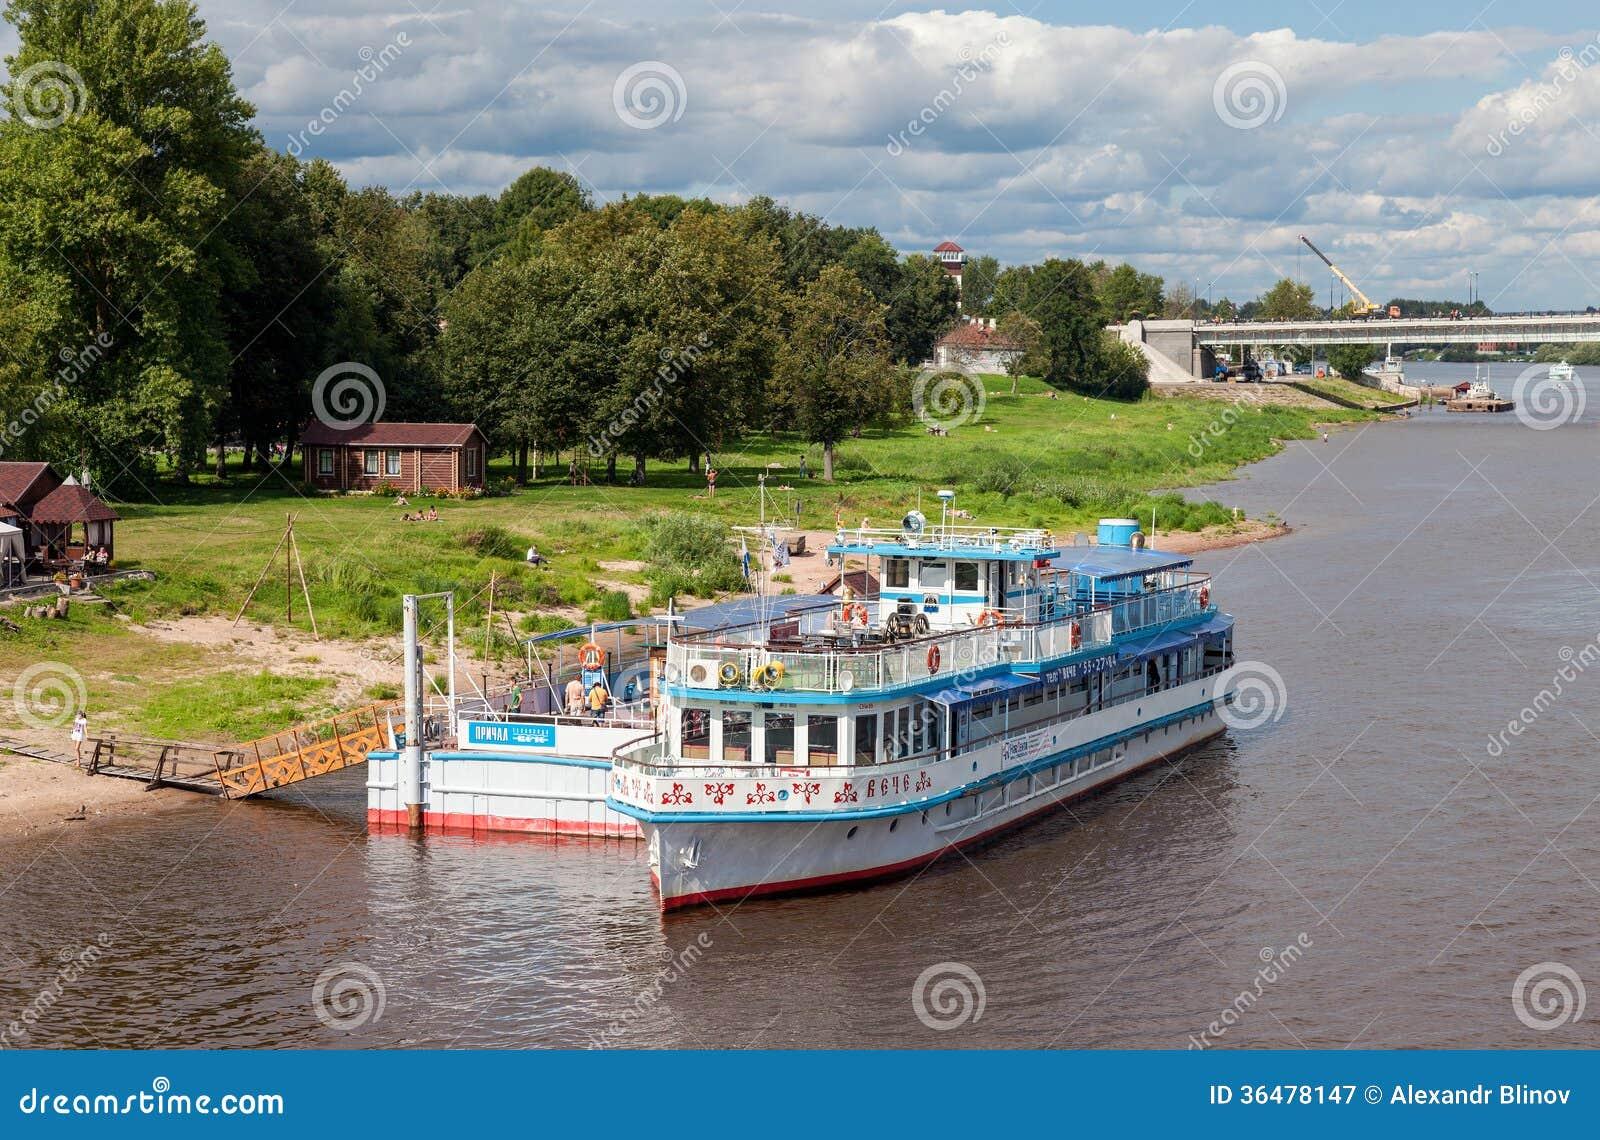 River cruise passenger catamaran at the moored on Volkhov river Editorial